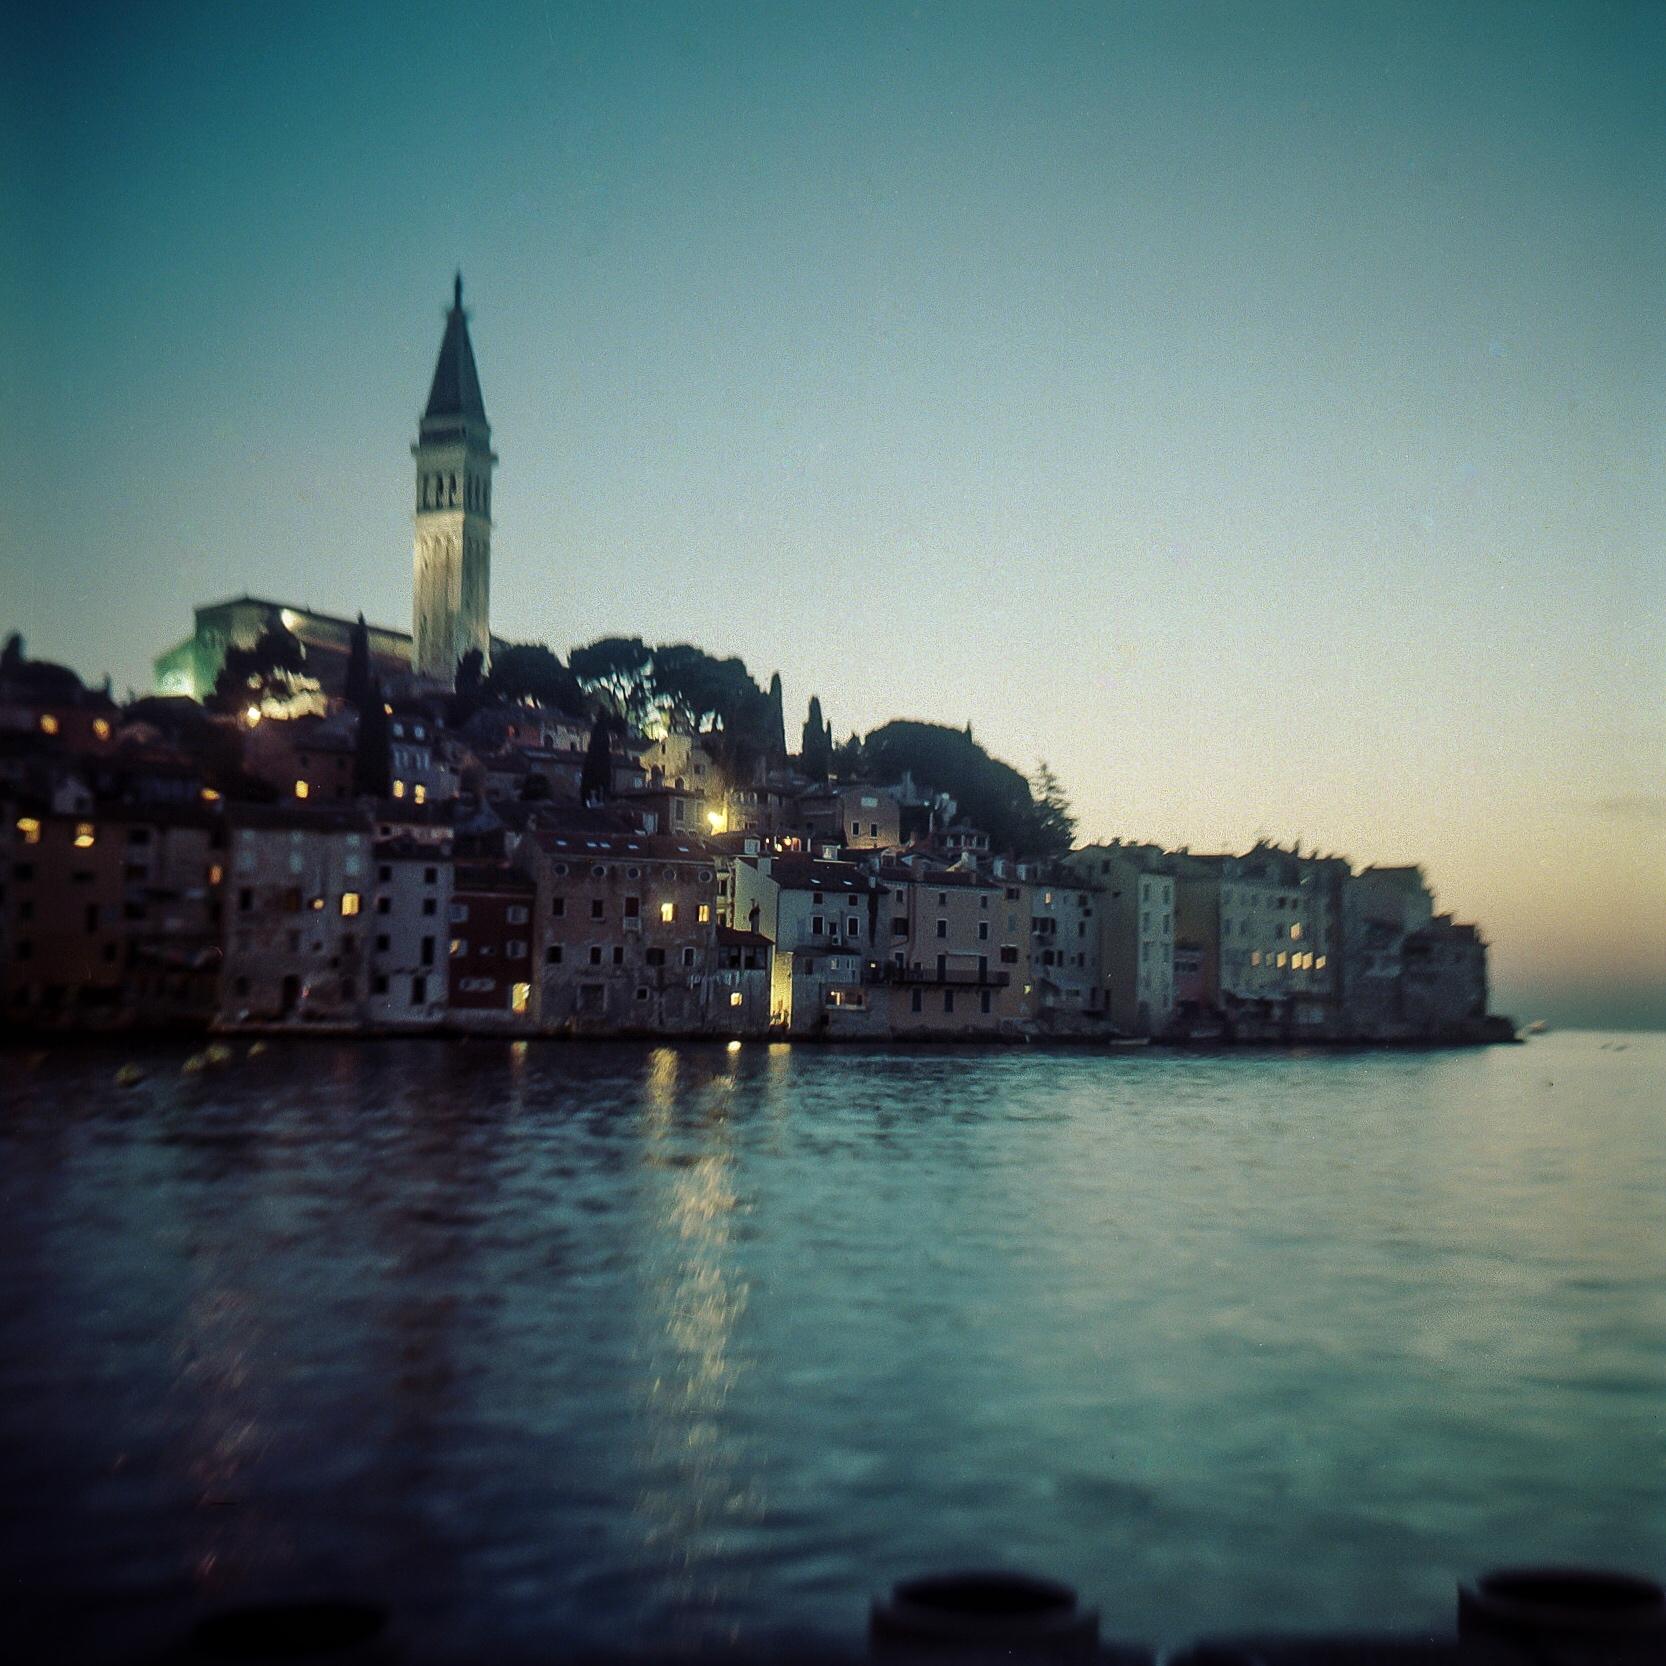 A long exposure shot (about 30 seconds) of Roninj, Croatia.